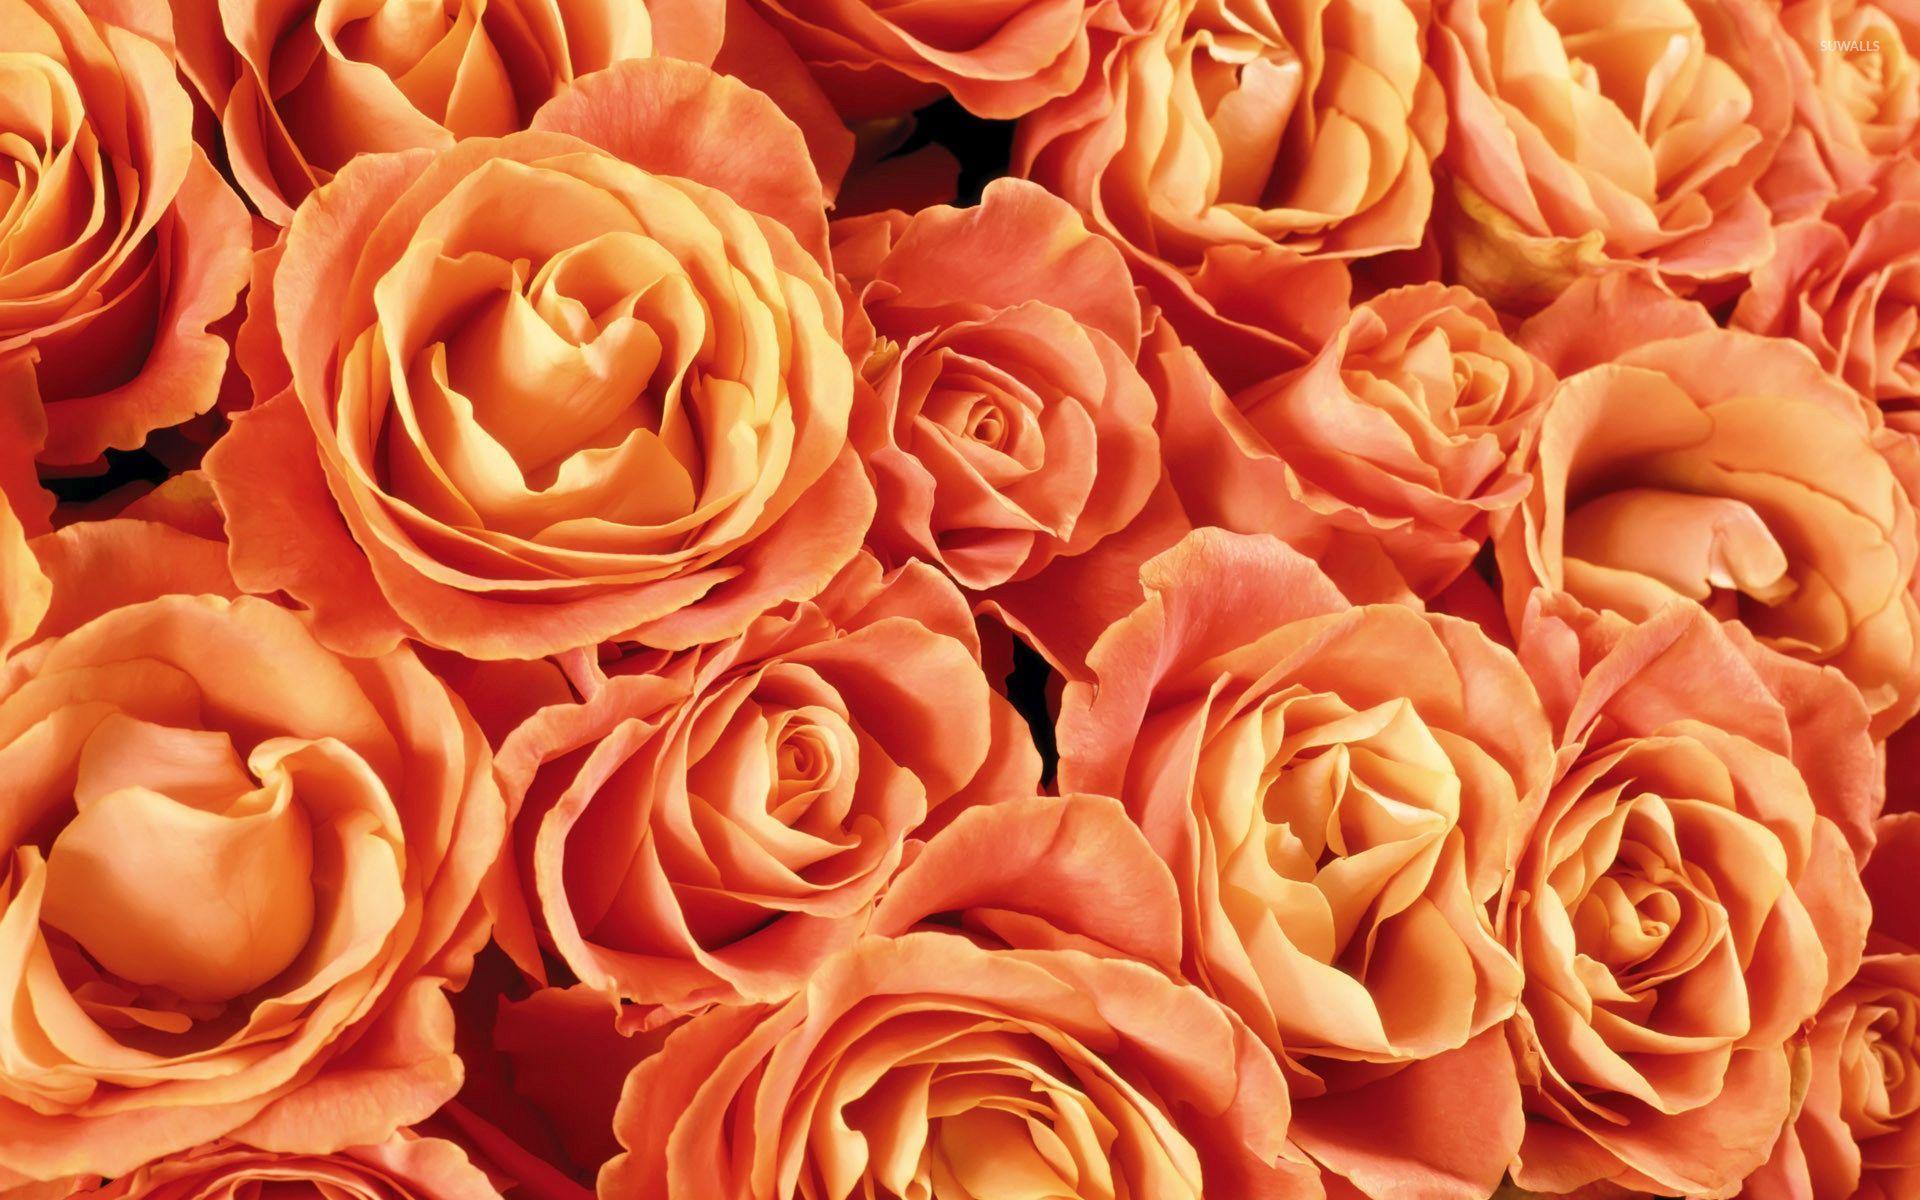 Orange Roses Wallpaper Flower Wallpapers 53987